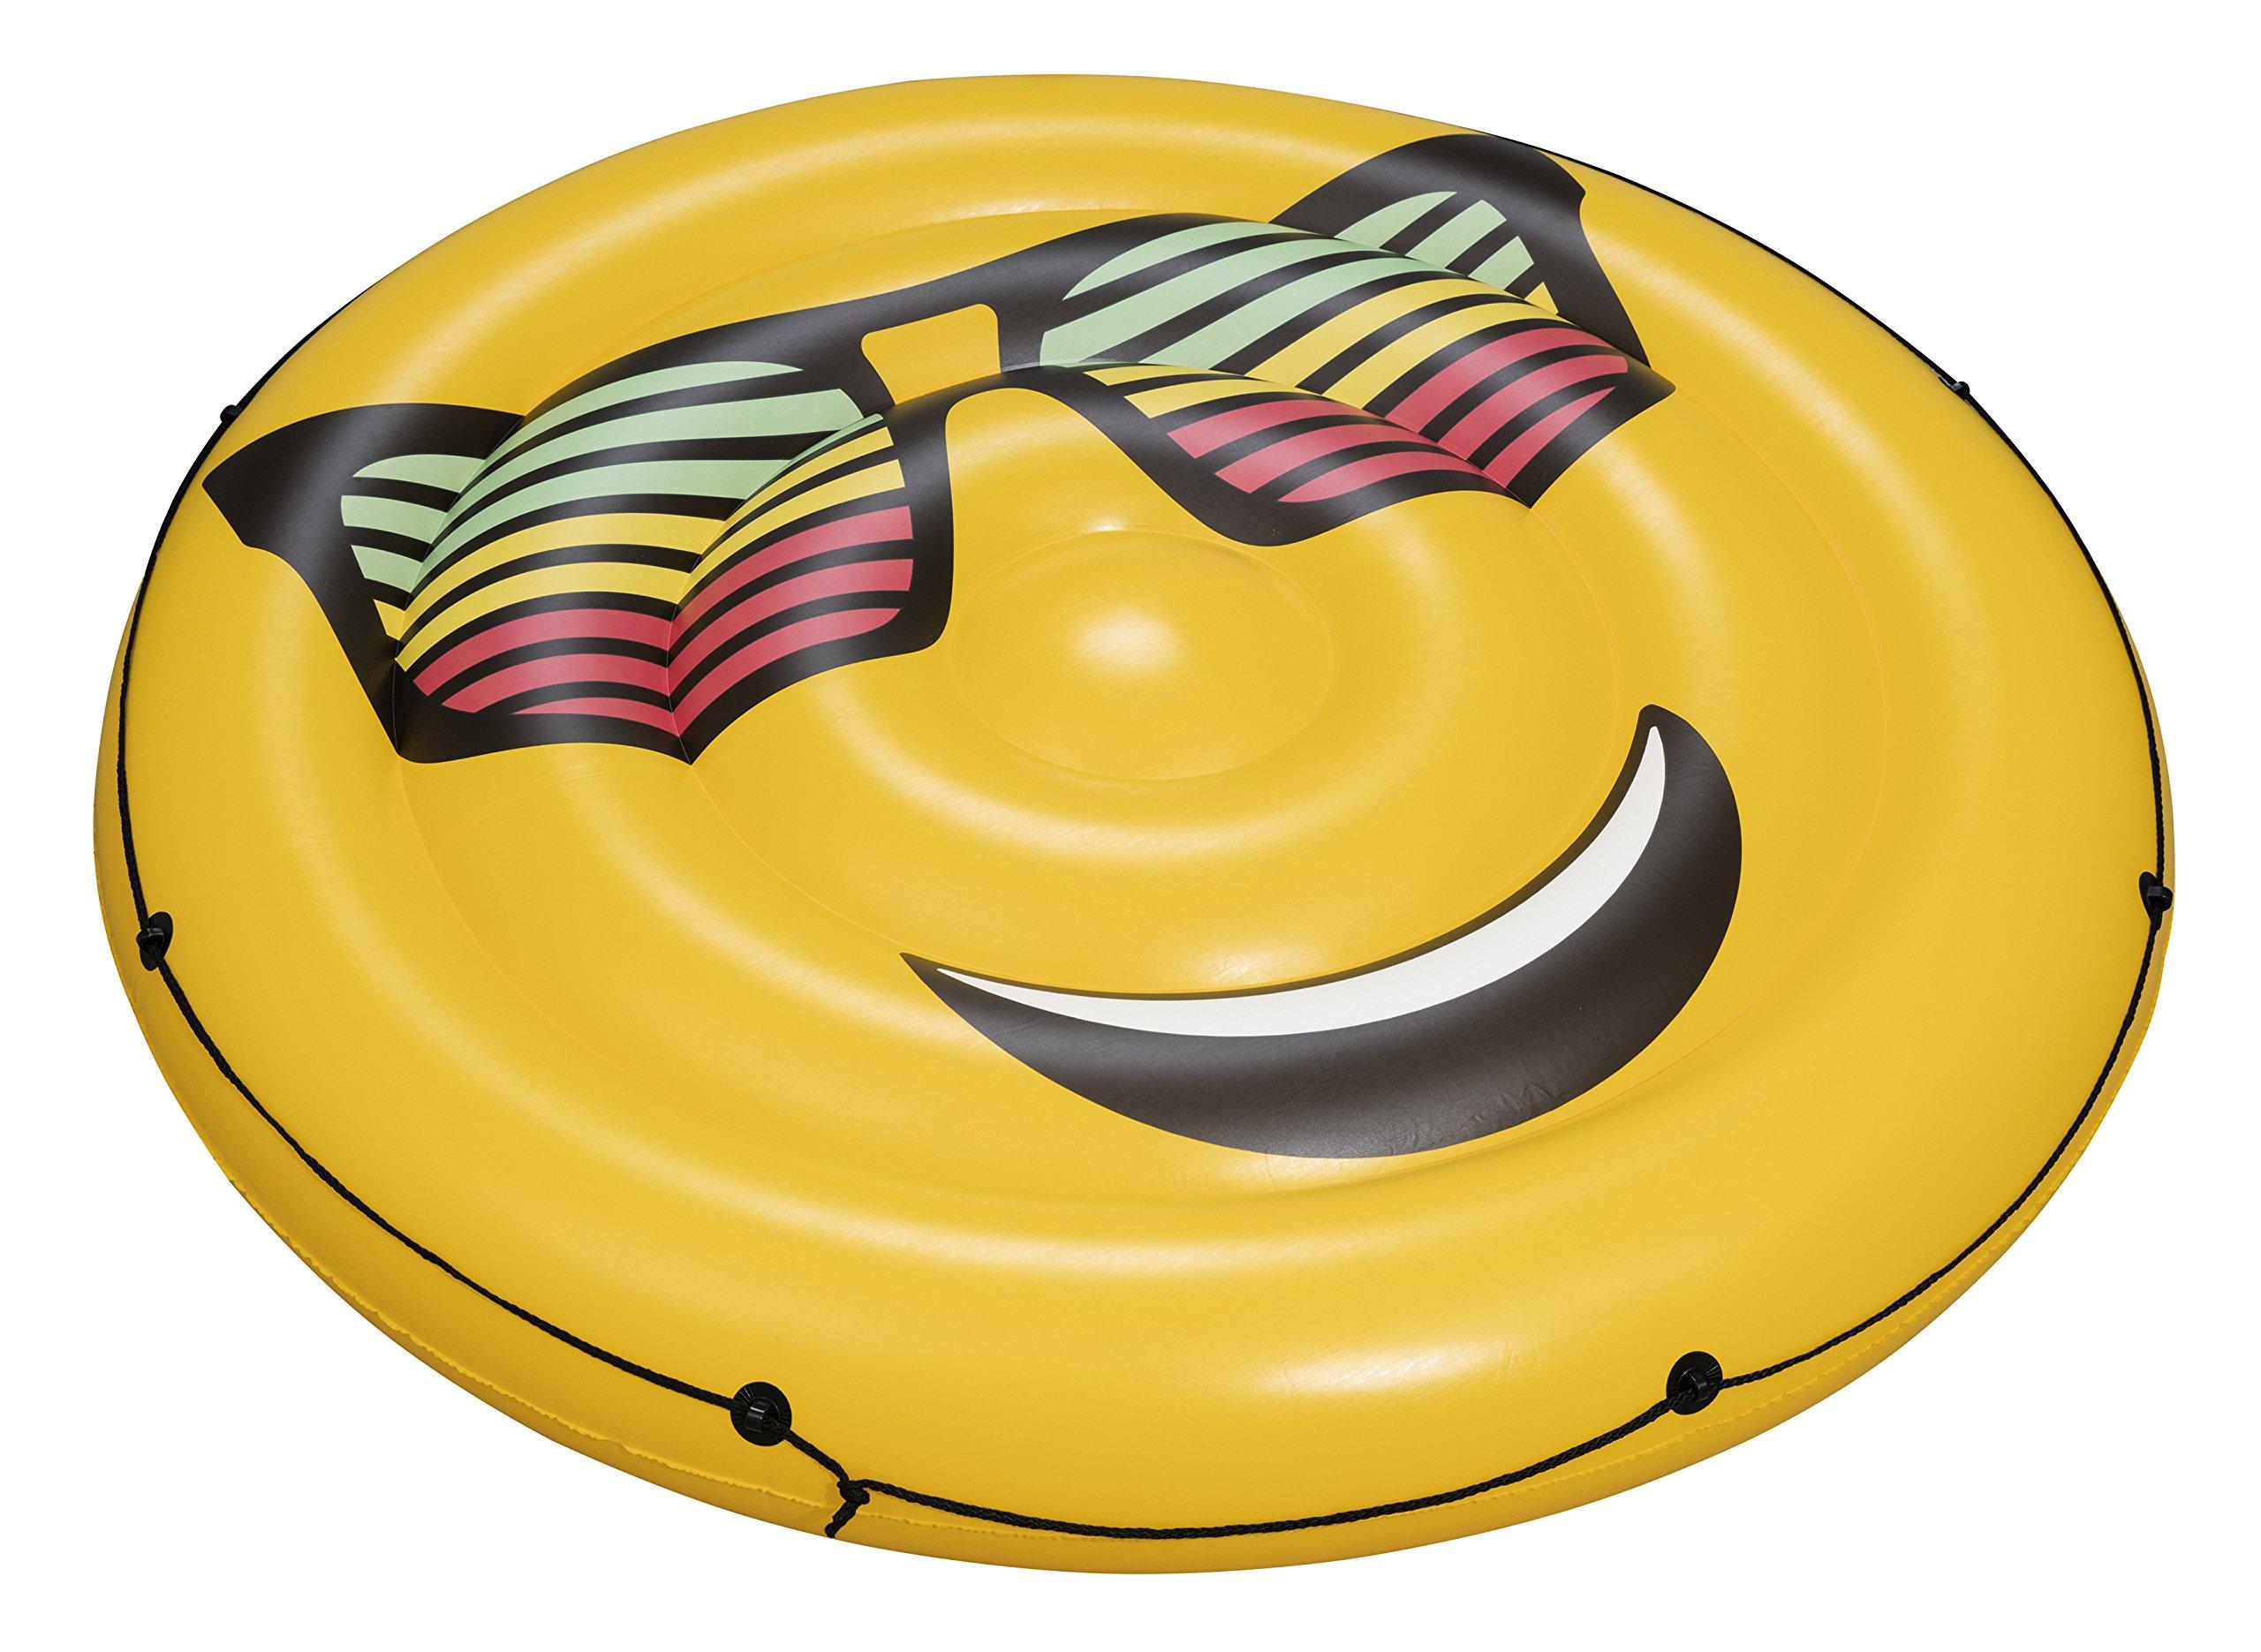 Bestway Summerstylez Inflatable Pool Float